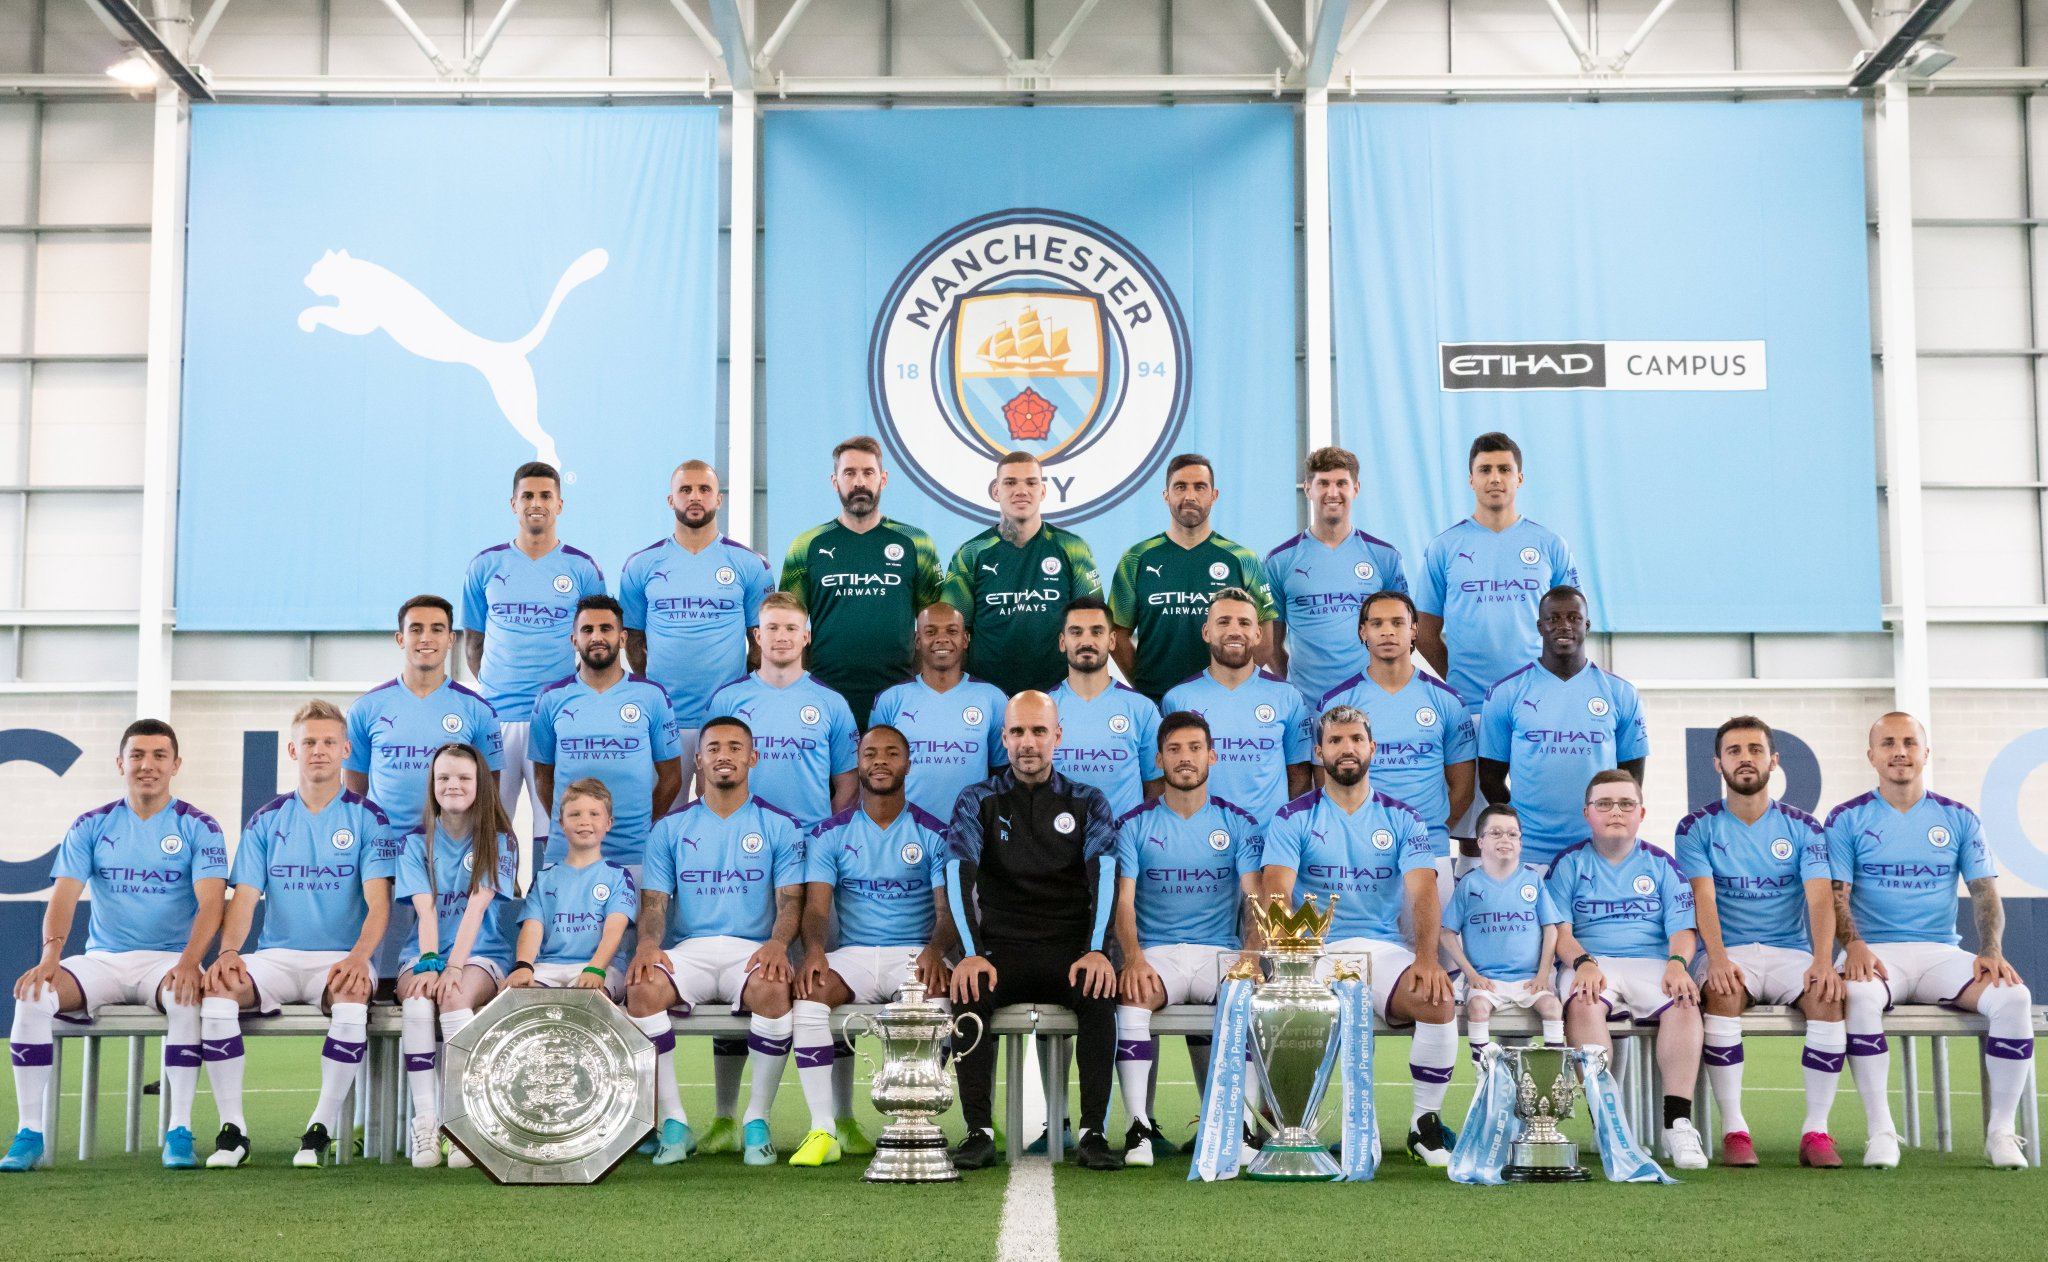 Hilo del Manchester City EGXgtHjXUAIRs3e